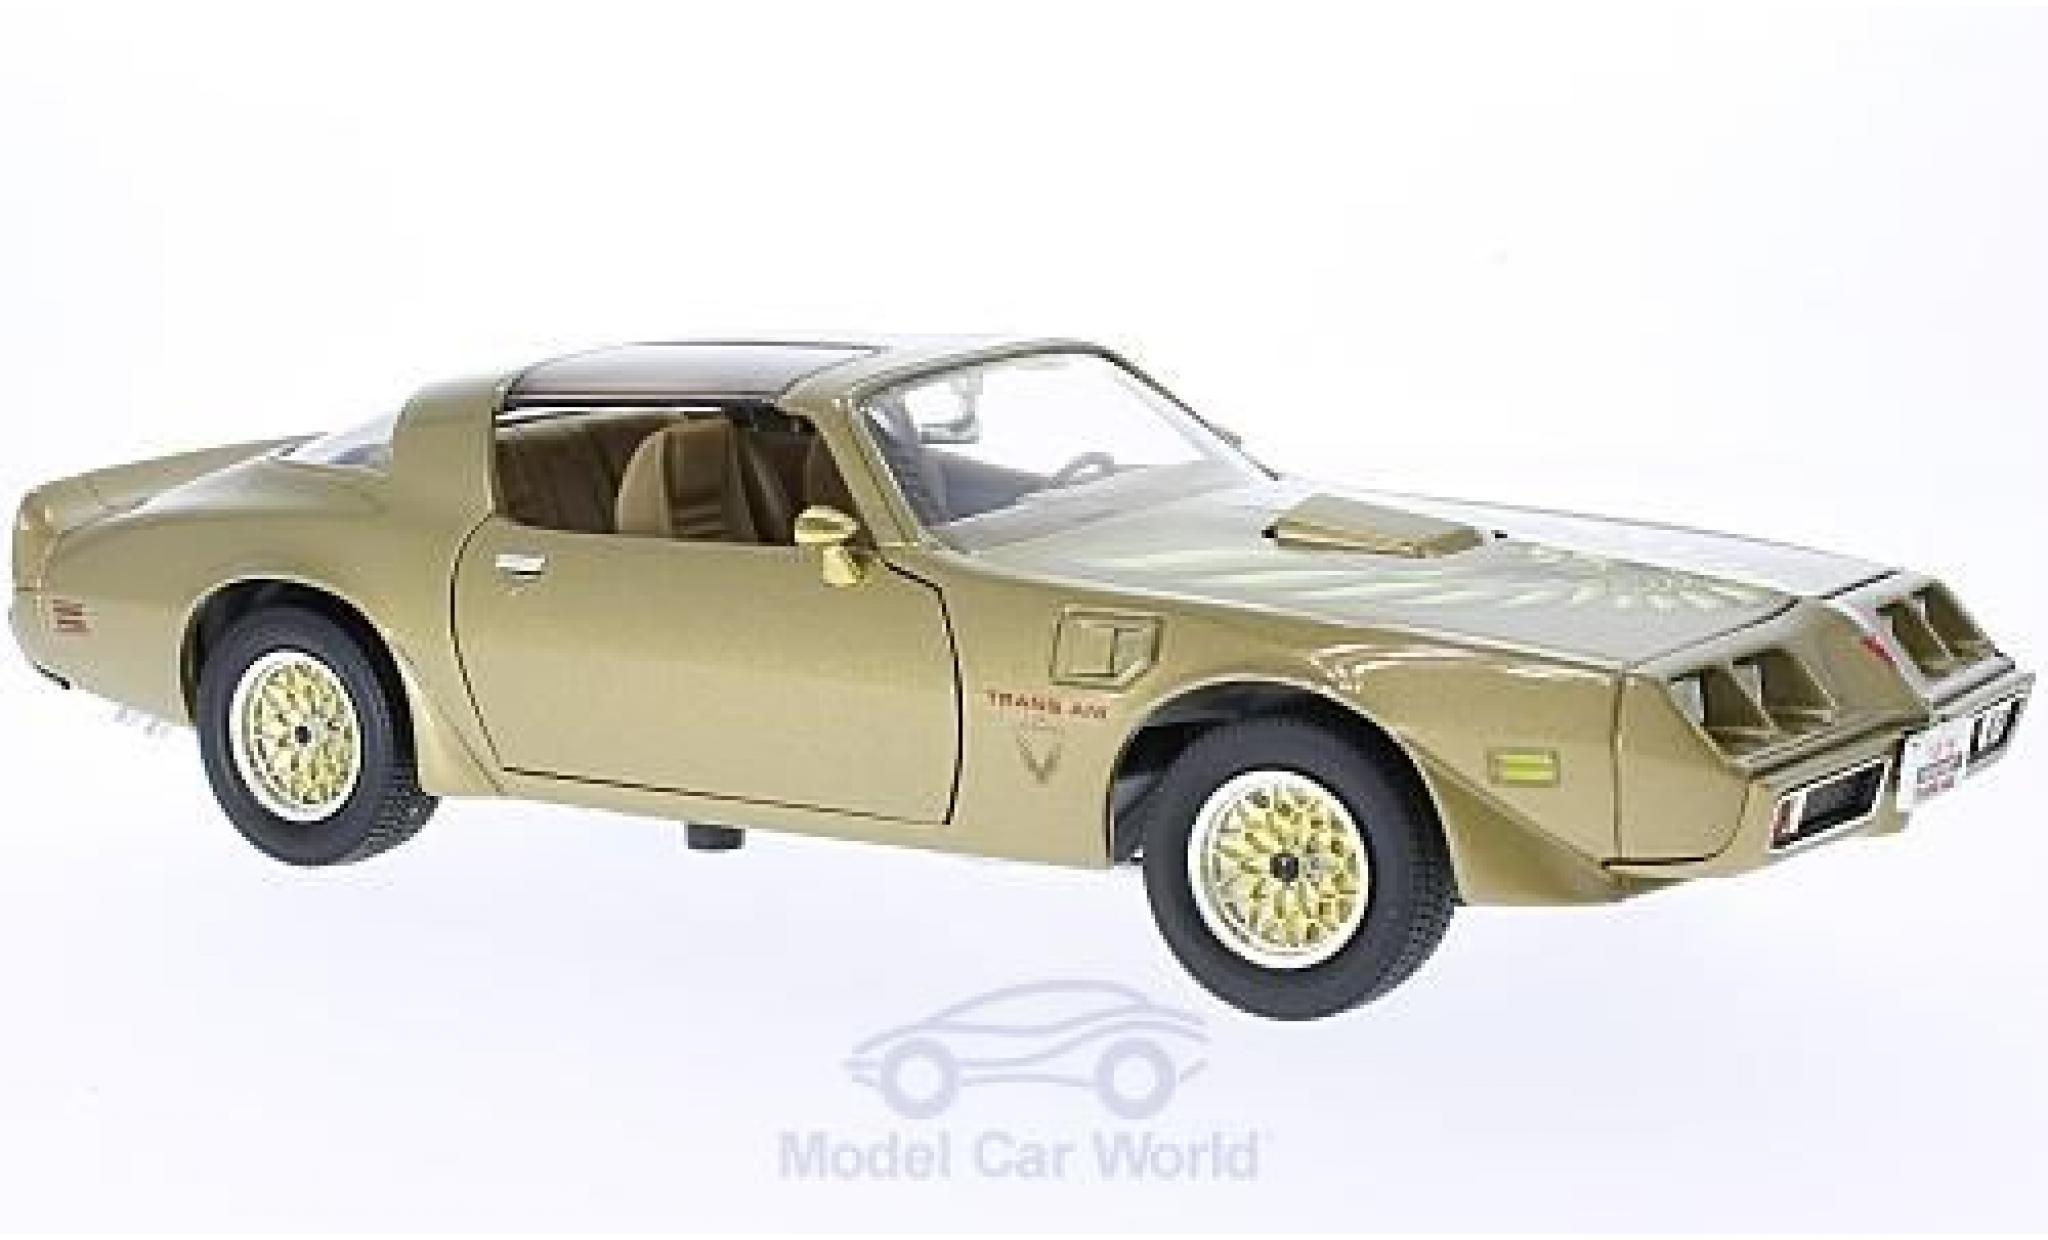 Diecast 1:18 Scale New 1979 Lucky Diecast Car- PONTIAC Firebird Trans Am